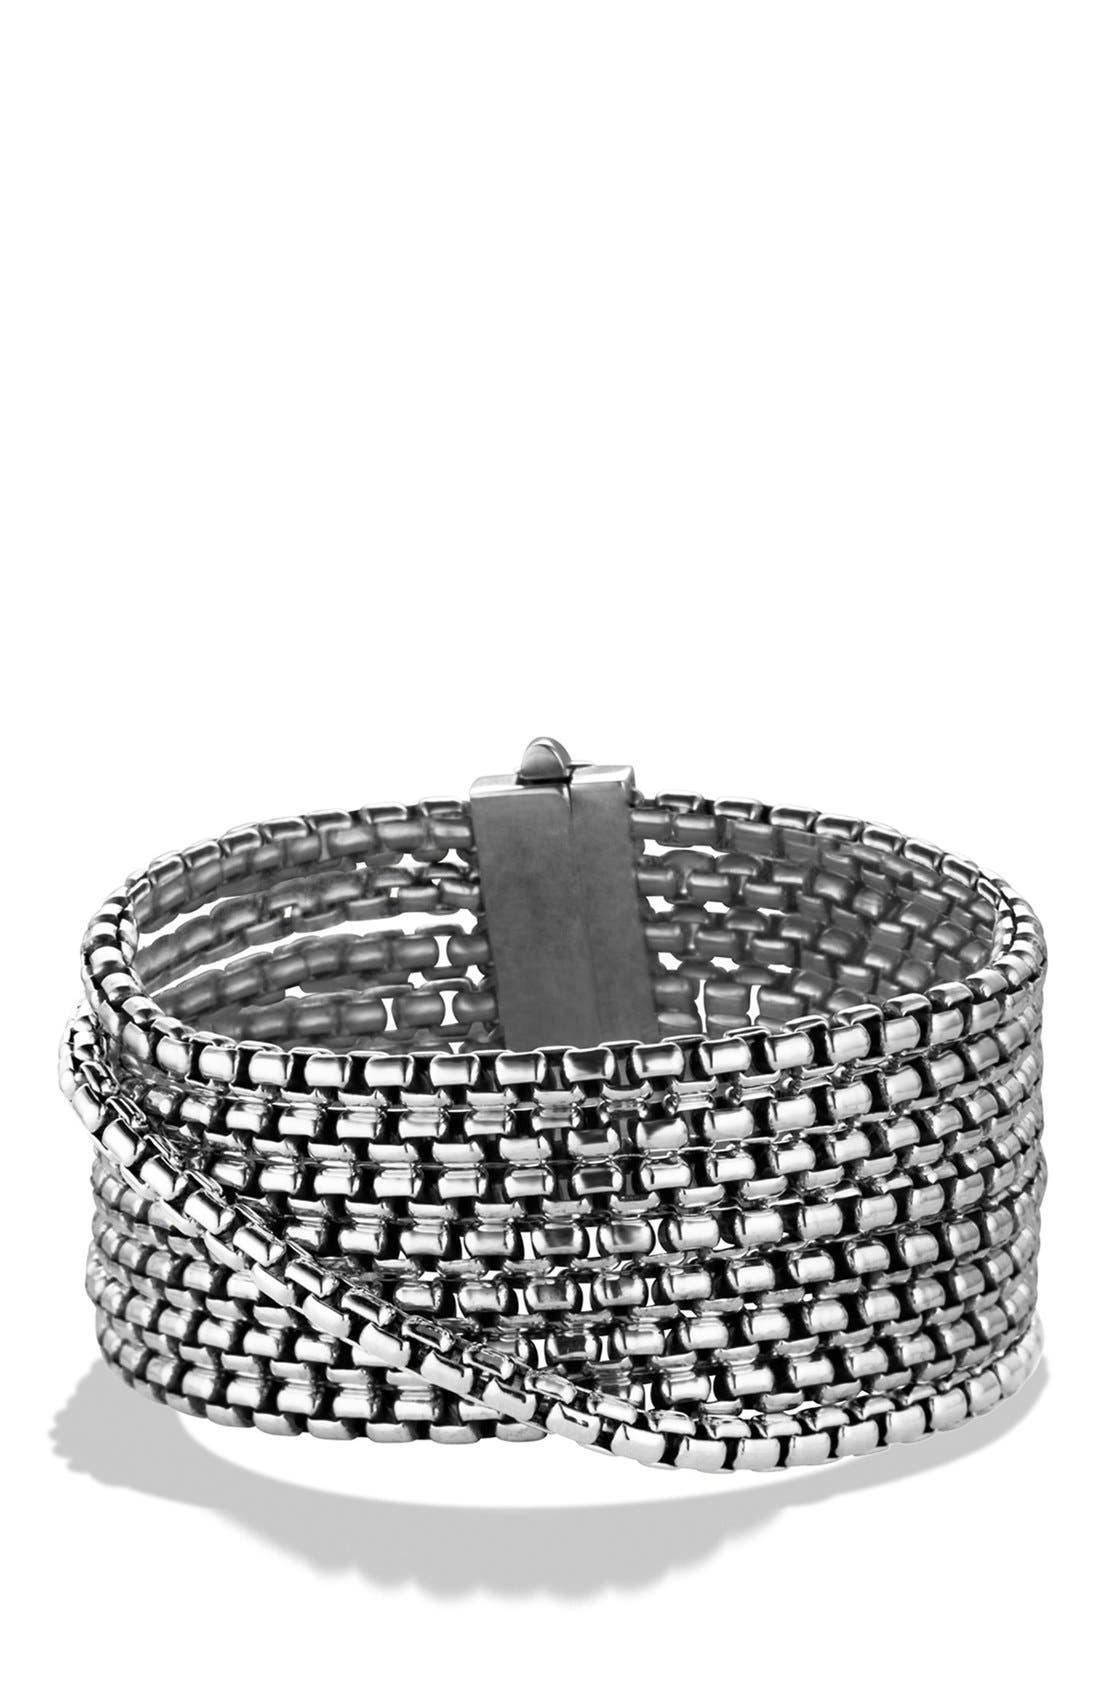 Main Image - David Yurman 'Box Chain' 8-Row Bracelet